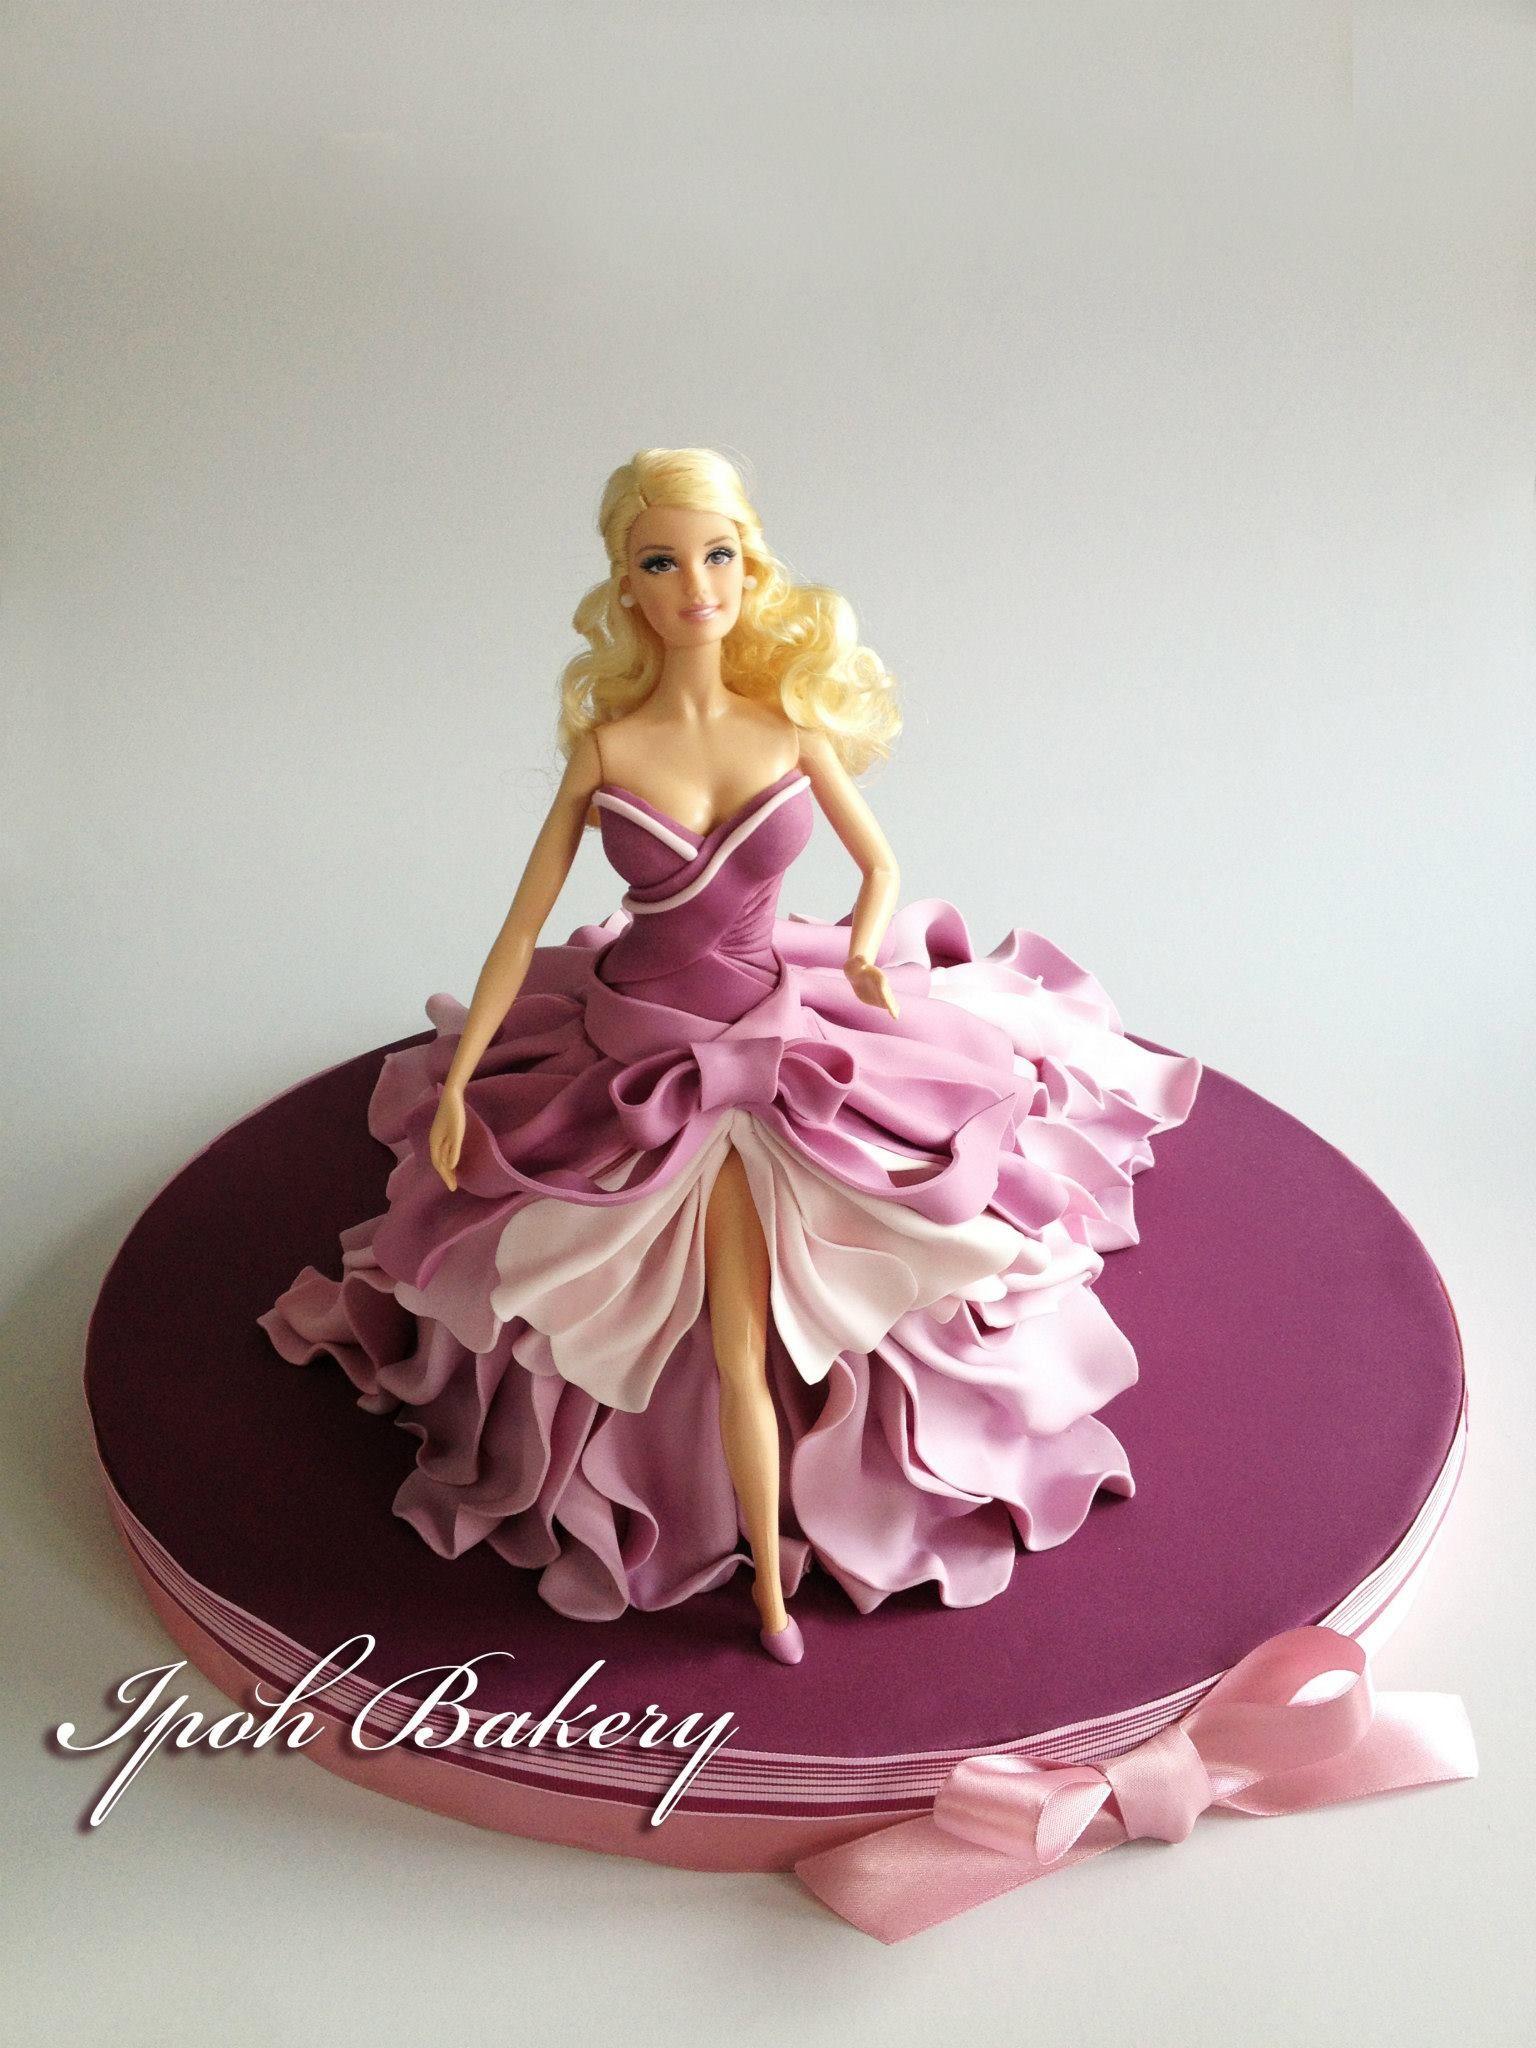 Barbie Doll Fondant Cake By Ipoh Bakery